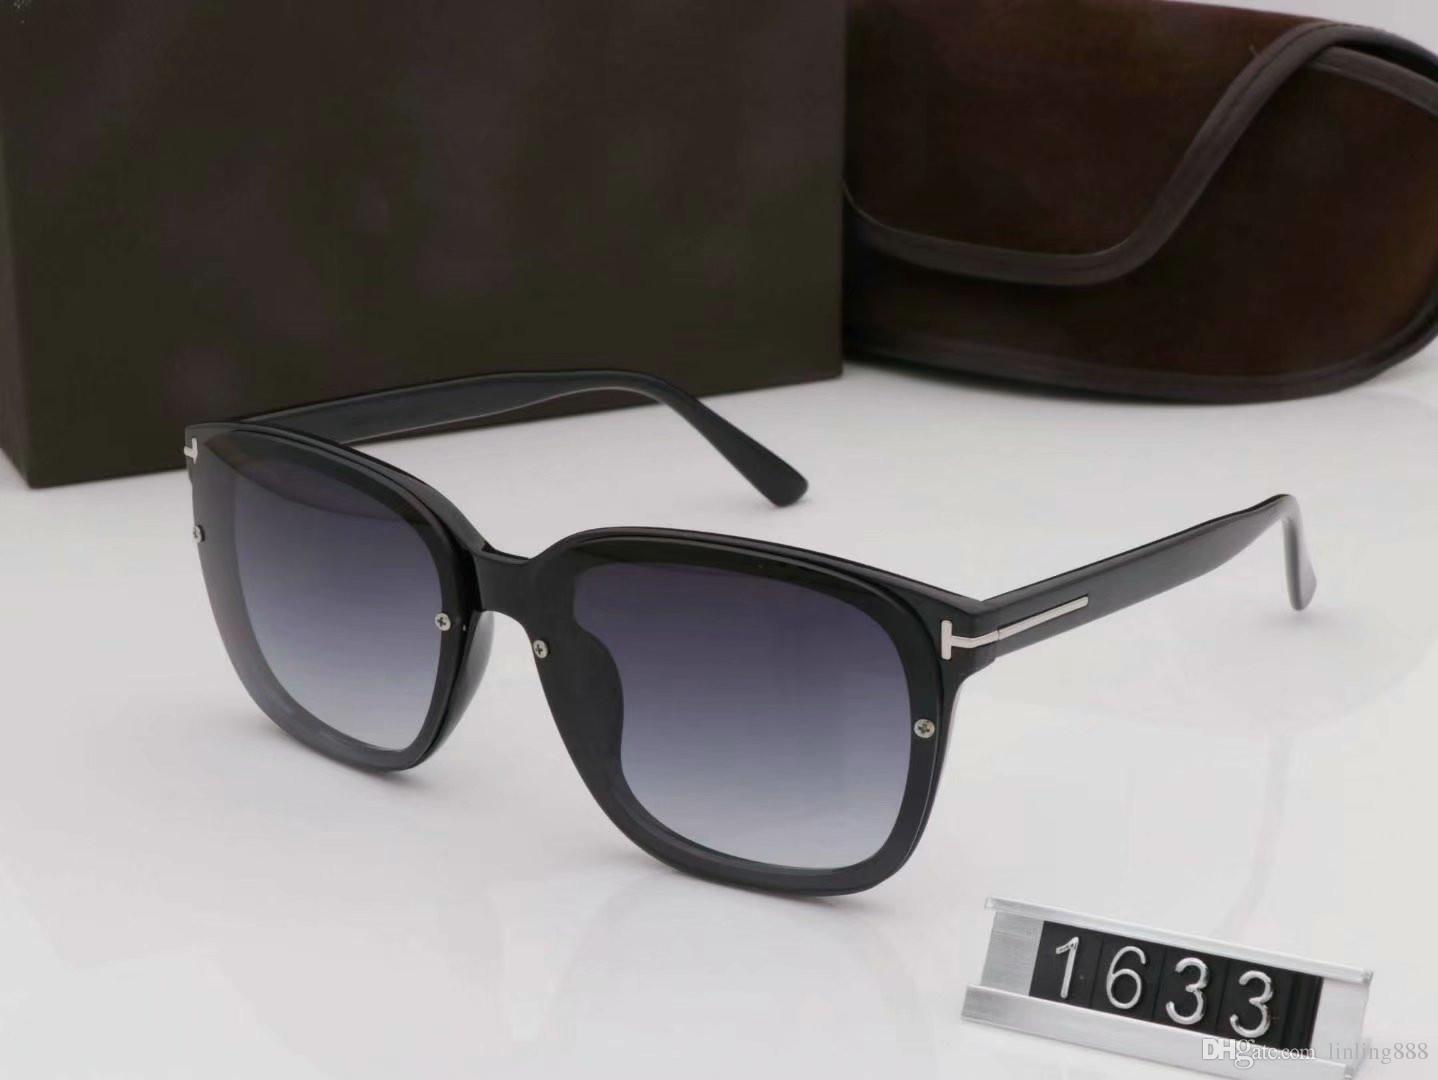 54dee33fca5 Mens Holt Sunglasses BLACK Polarized Aviator Style Women Men Sunglasses  Henry Havana Plastic Asian Fit Oversized Black Polarized Sunglasses Online  with ...